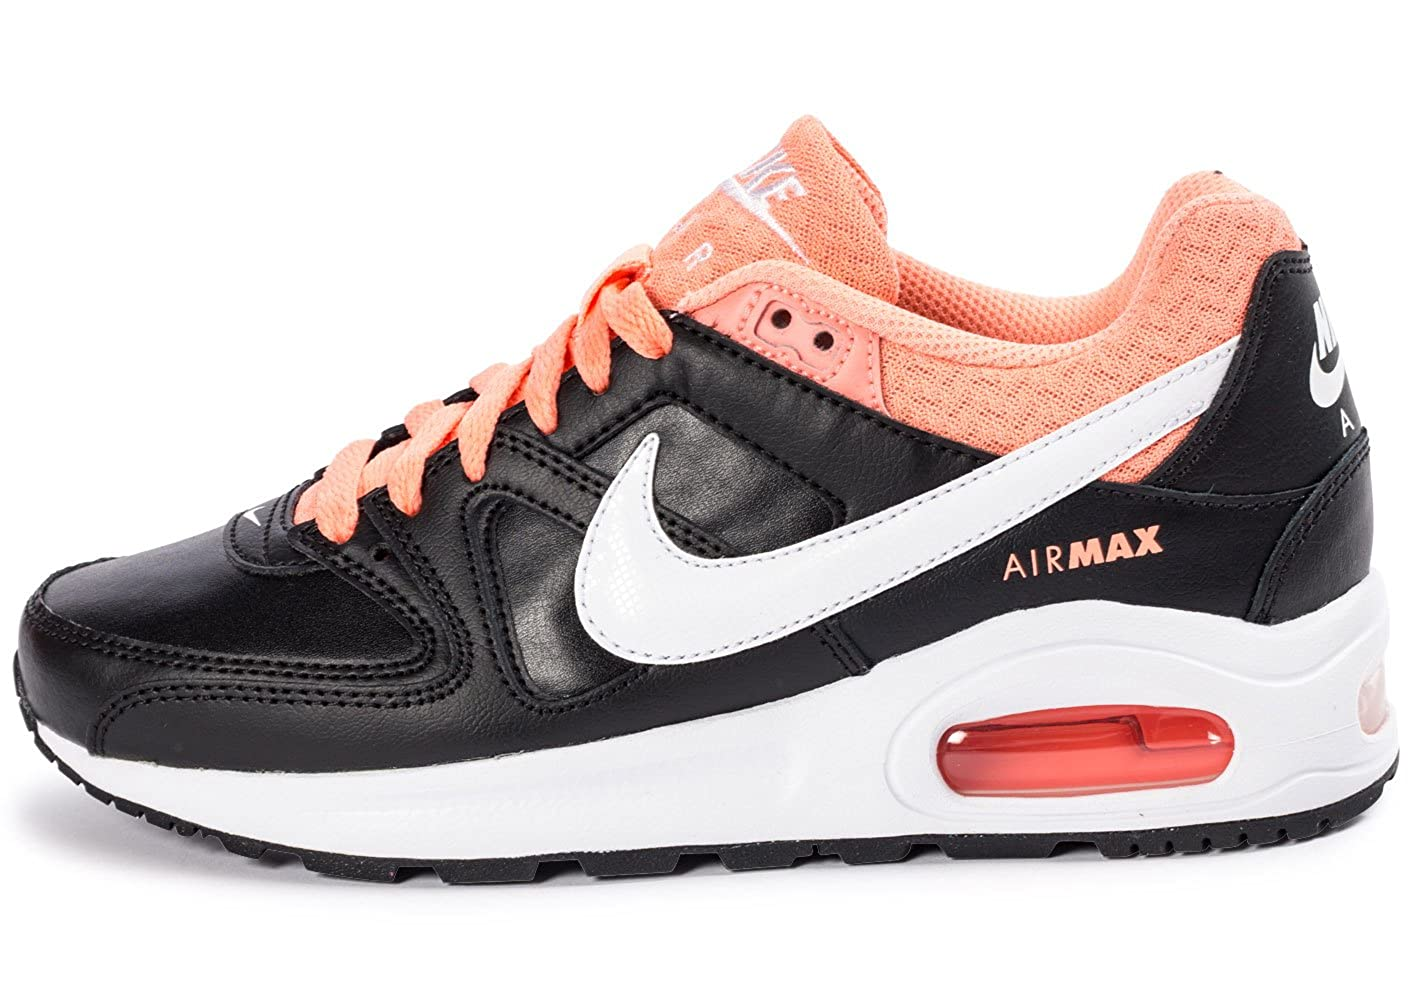 cheaper c9091 4ac53 Nike Air Max Command Flex LTR Gs, Girls  Running